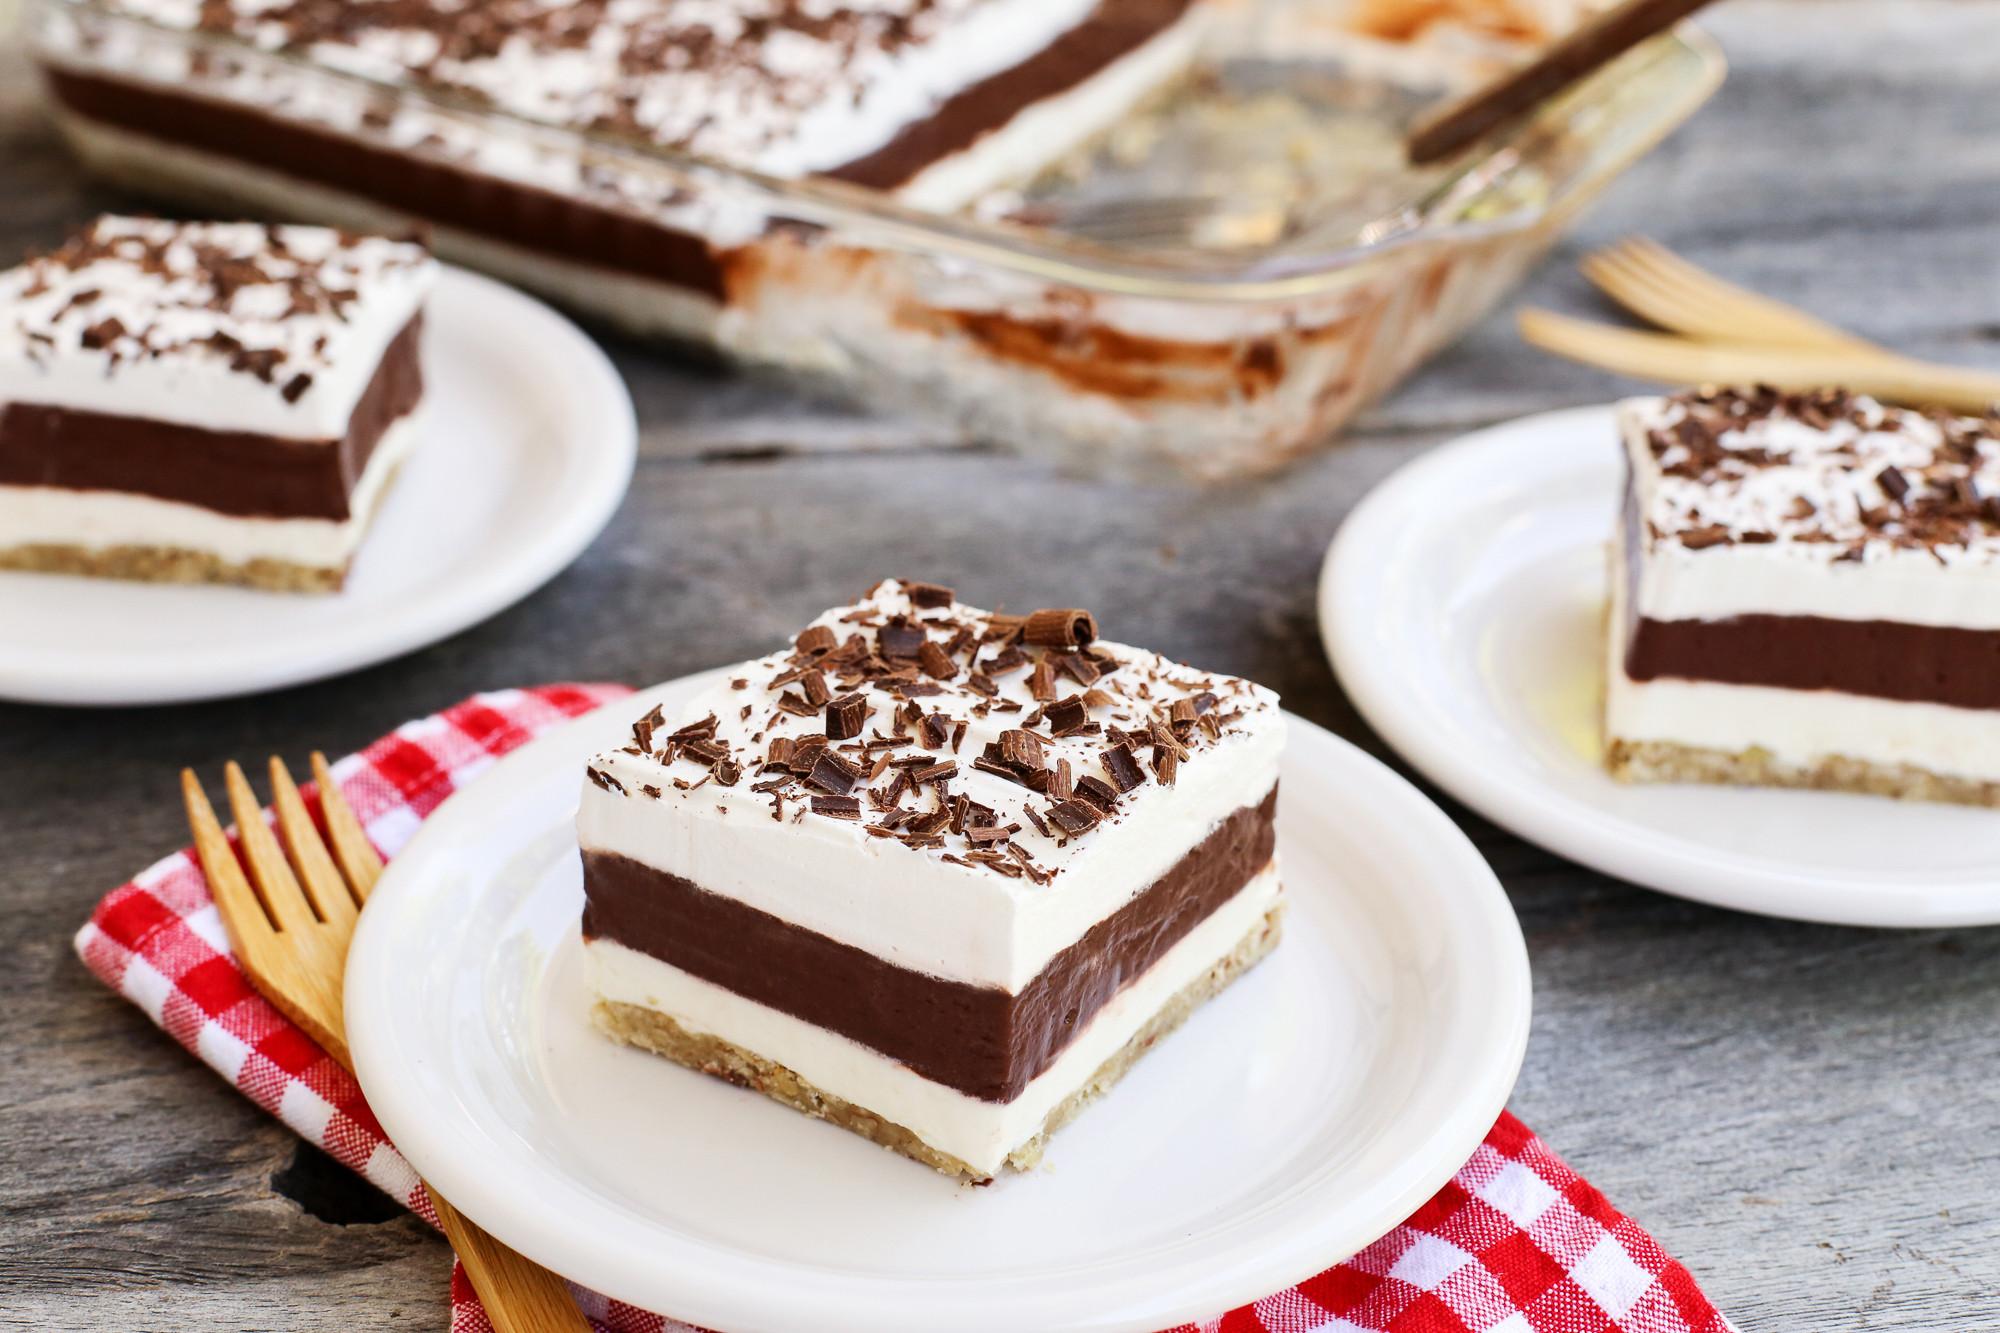 Pudding Dessert Recipe  Layered Chocolate Pudding Dessert